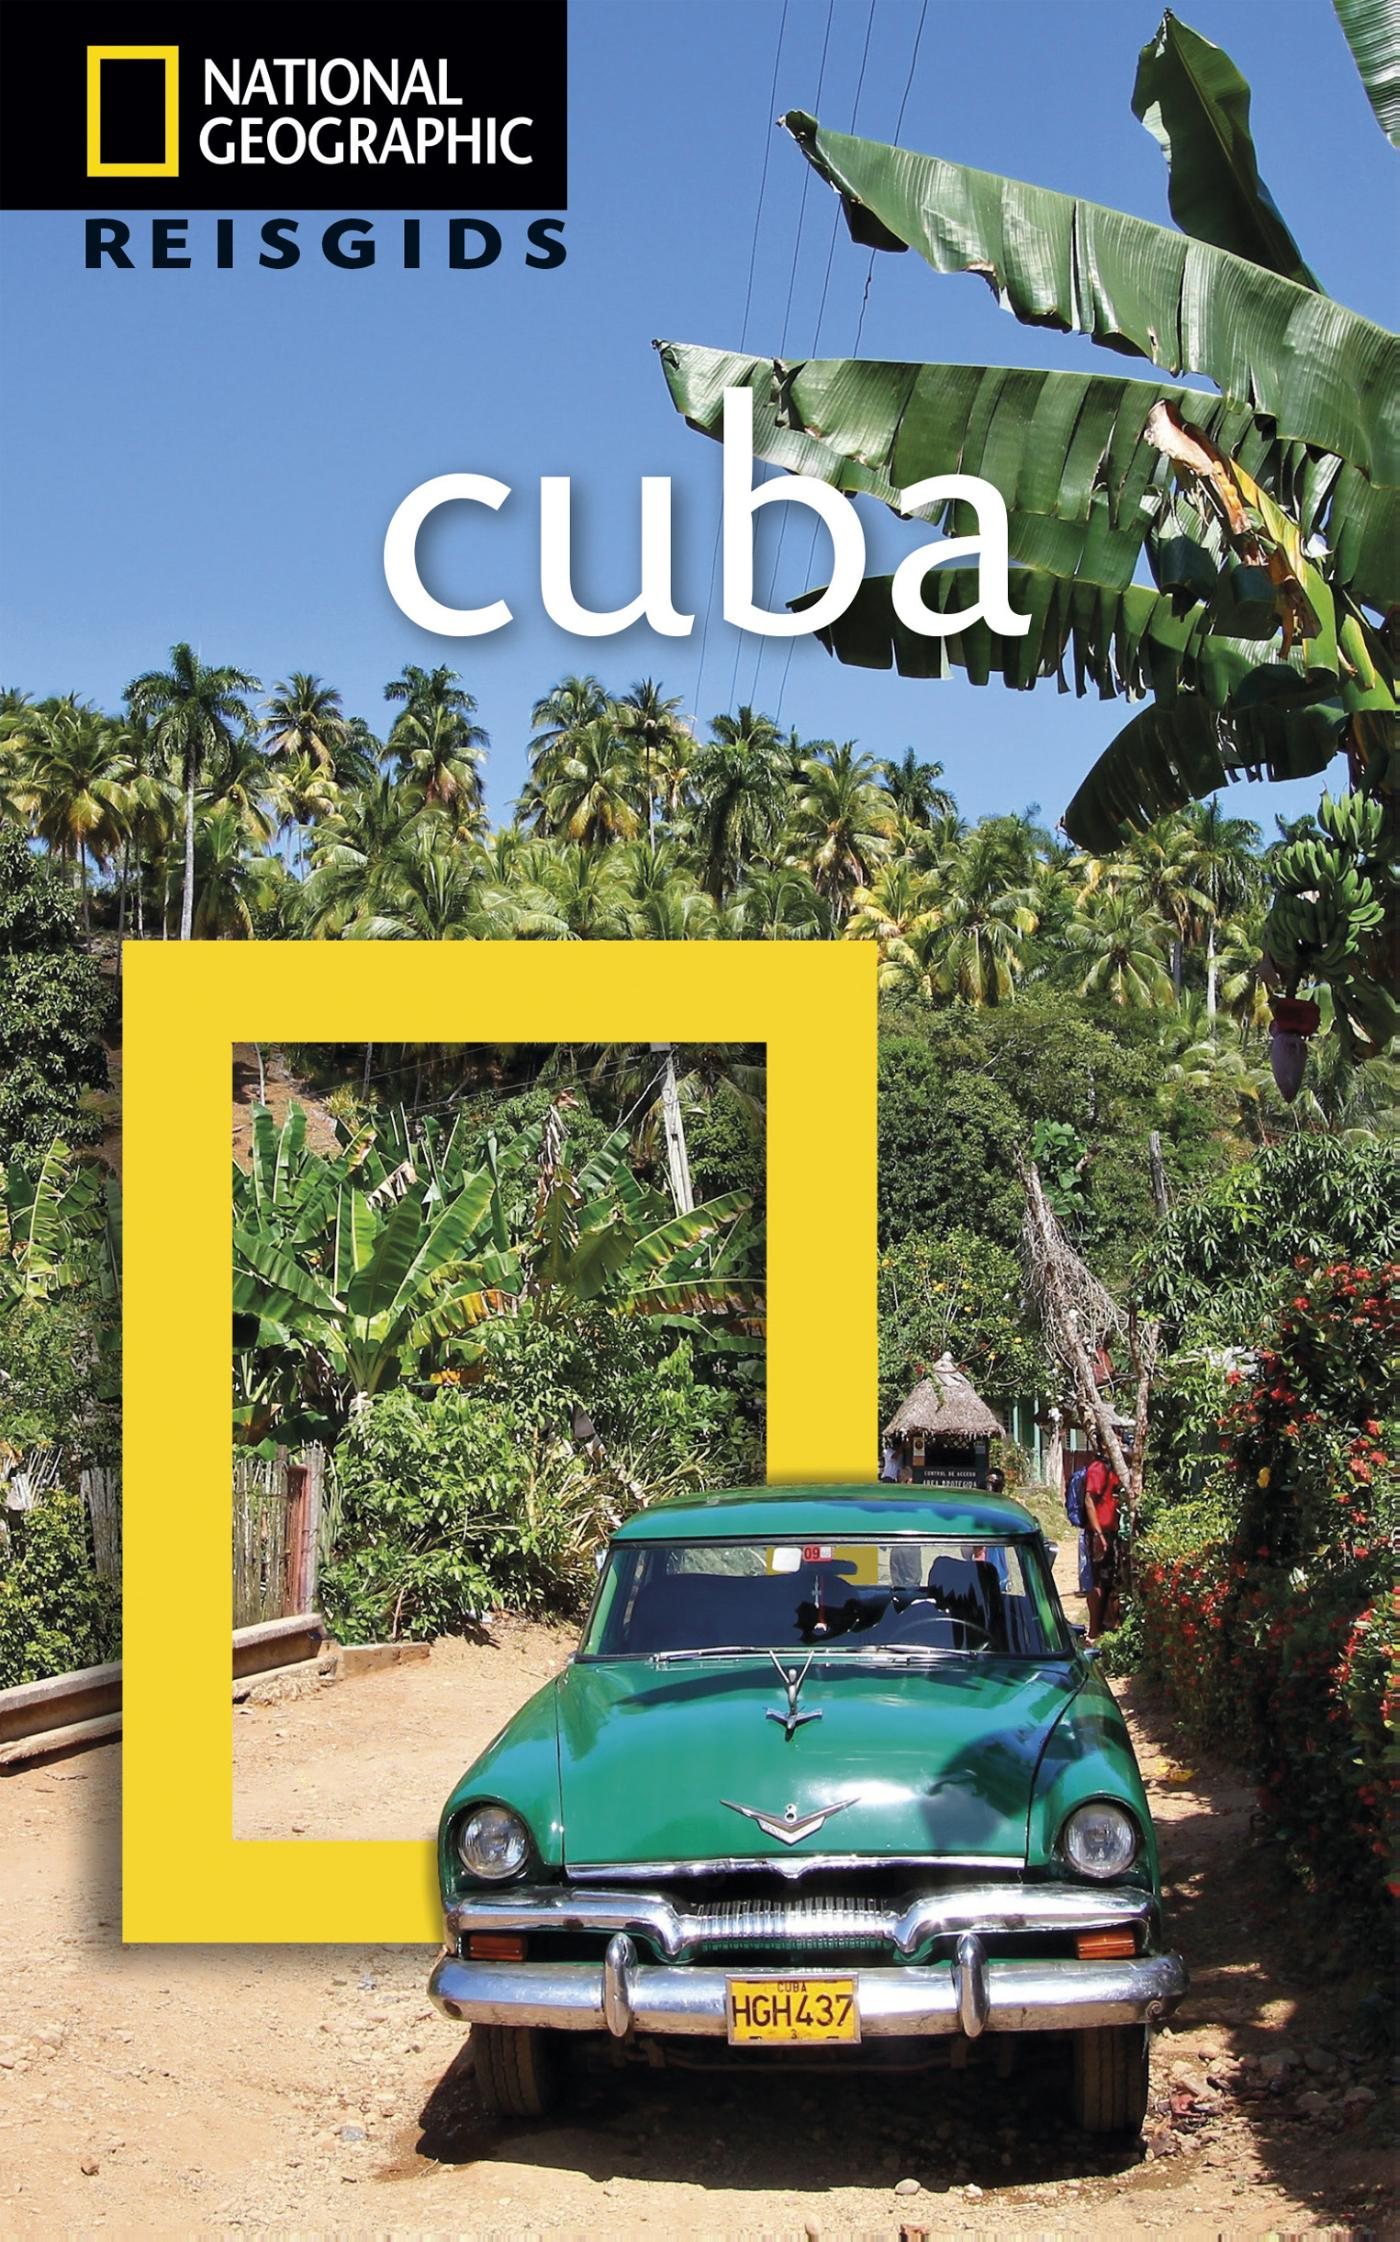 National Geographic Reisgids: Cuba